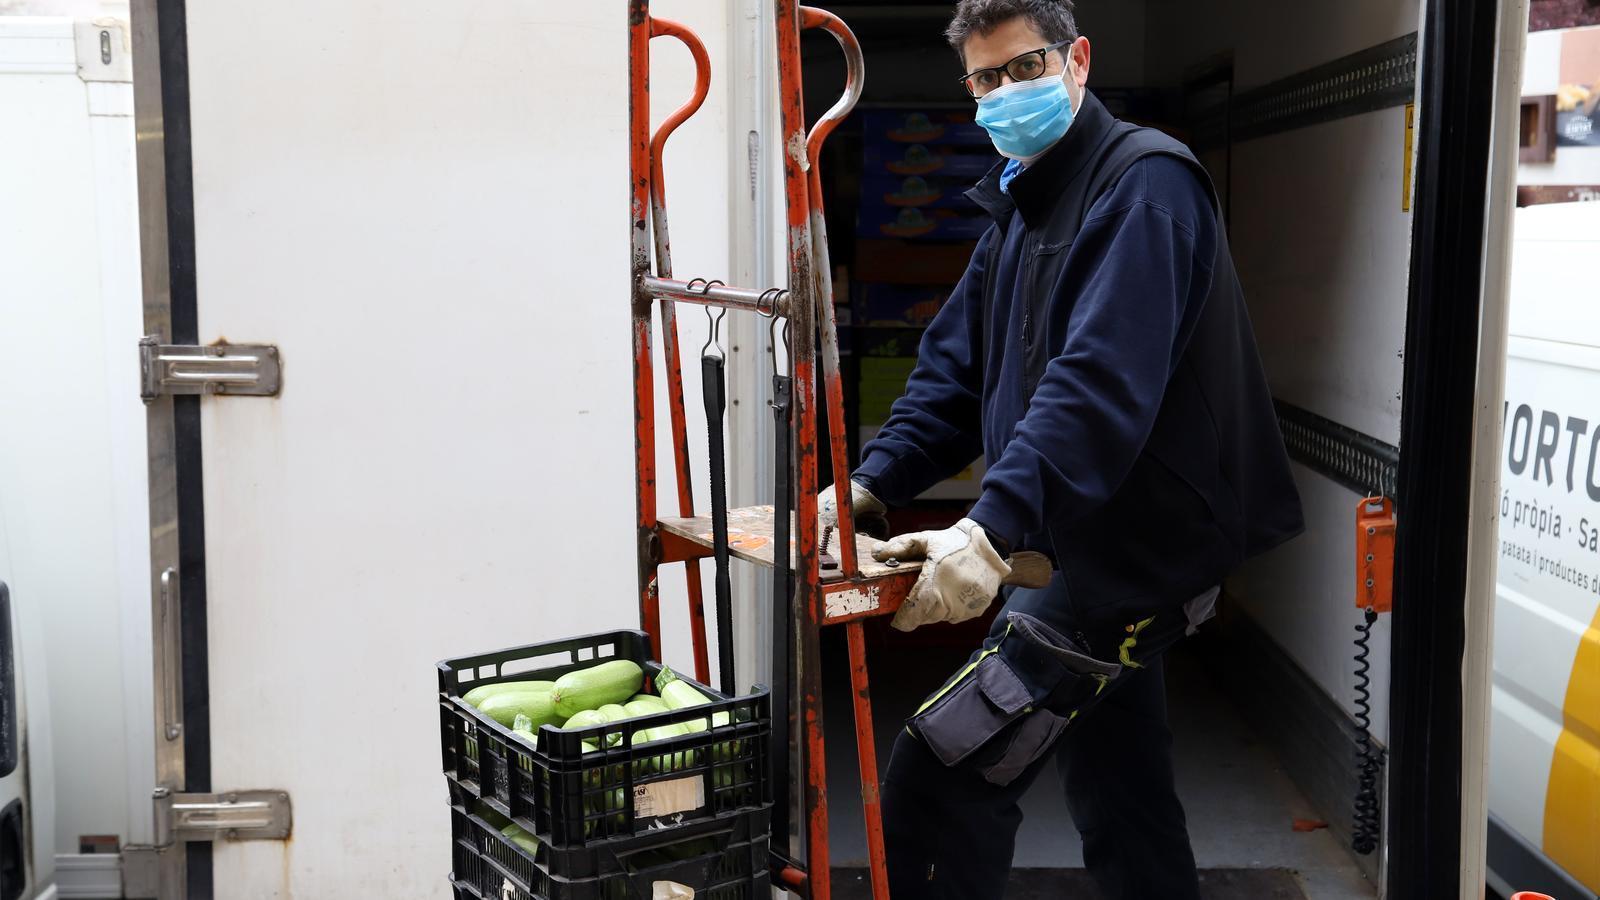 Paco Amat repartint fruita i verdura durant la seva jornada laboral